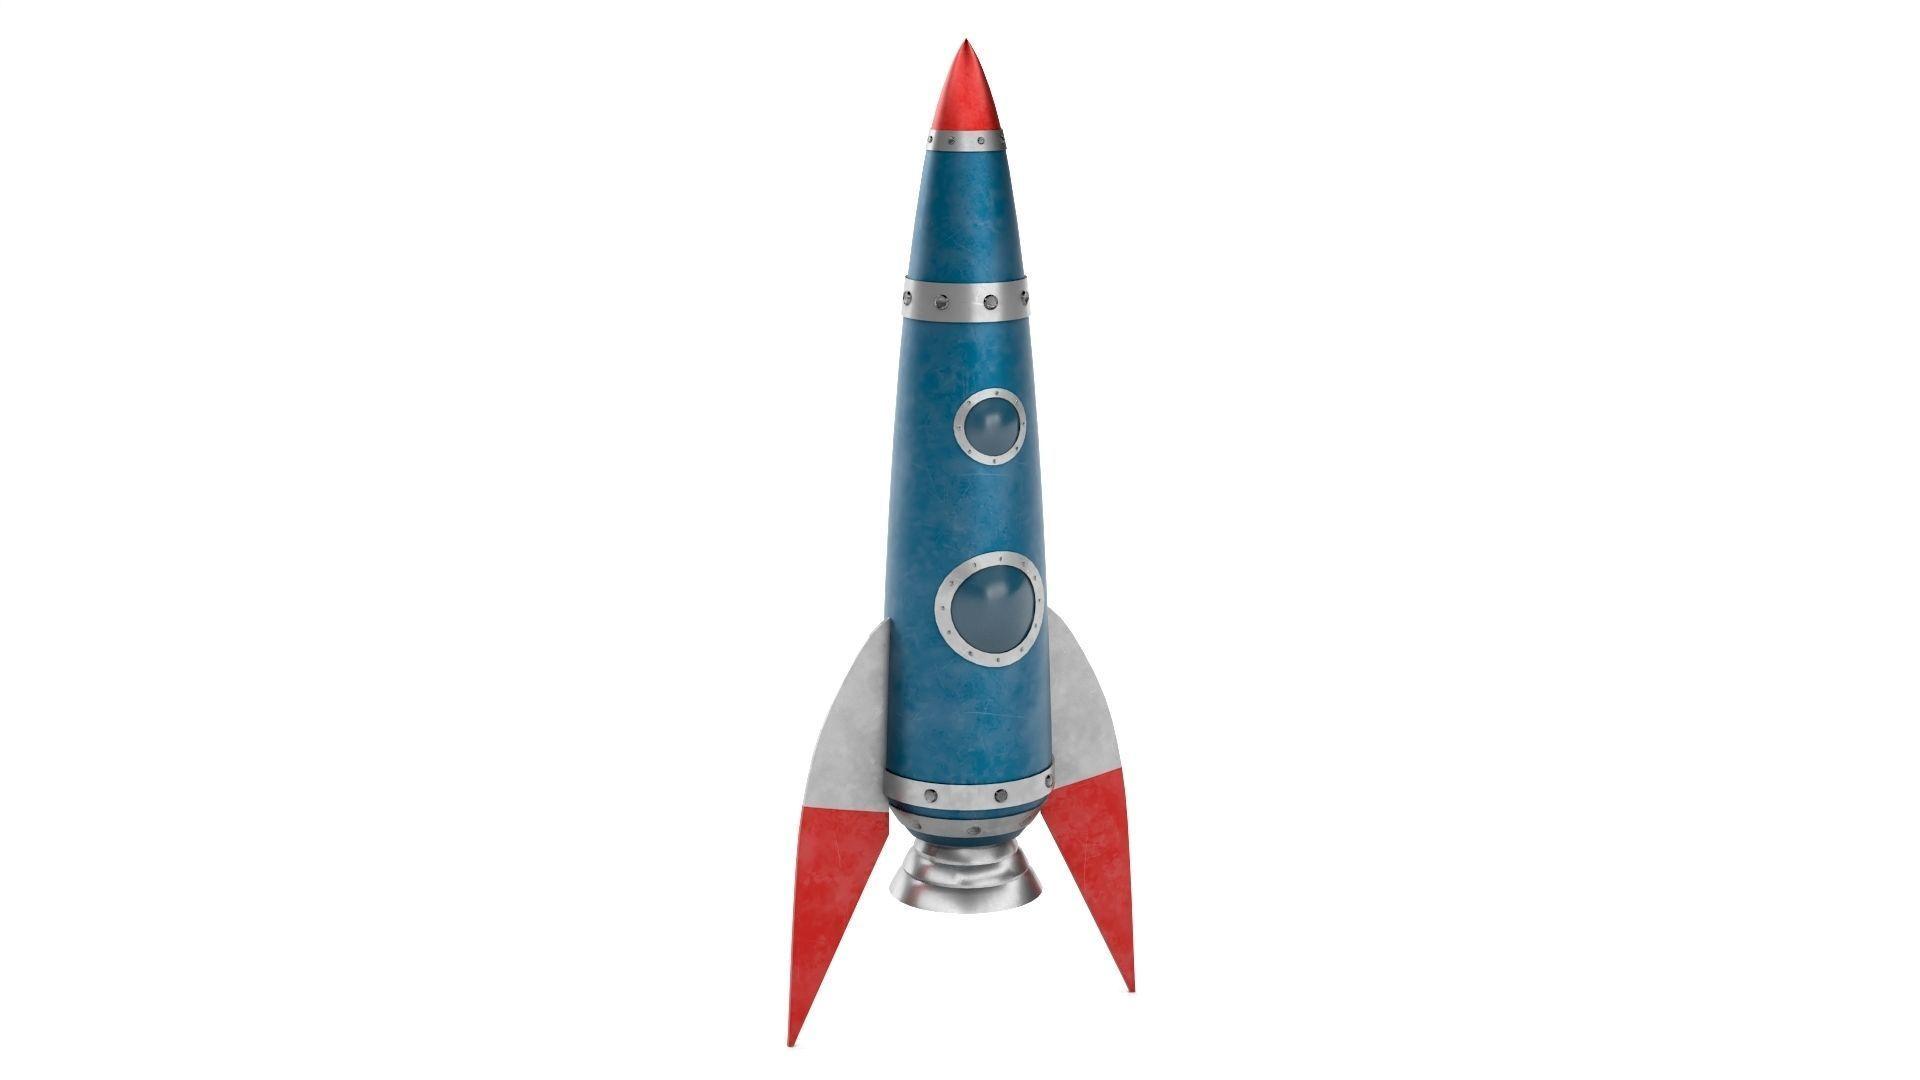 Blue Metal Rocket